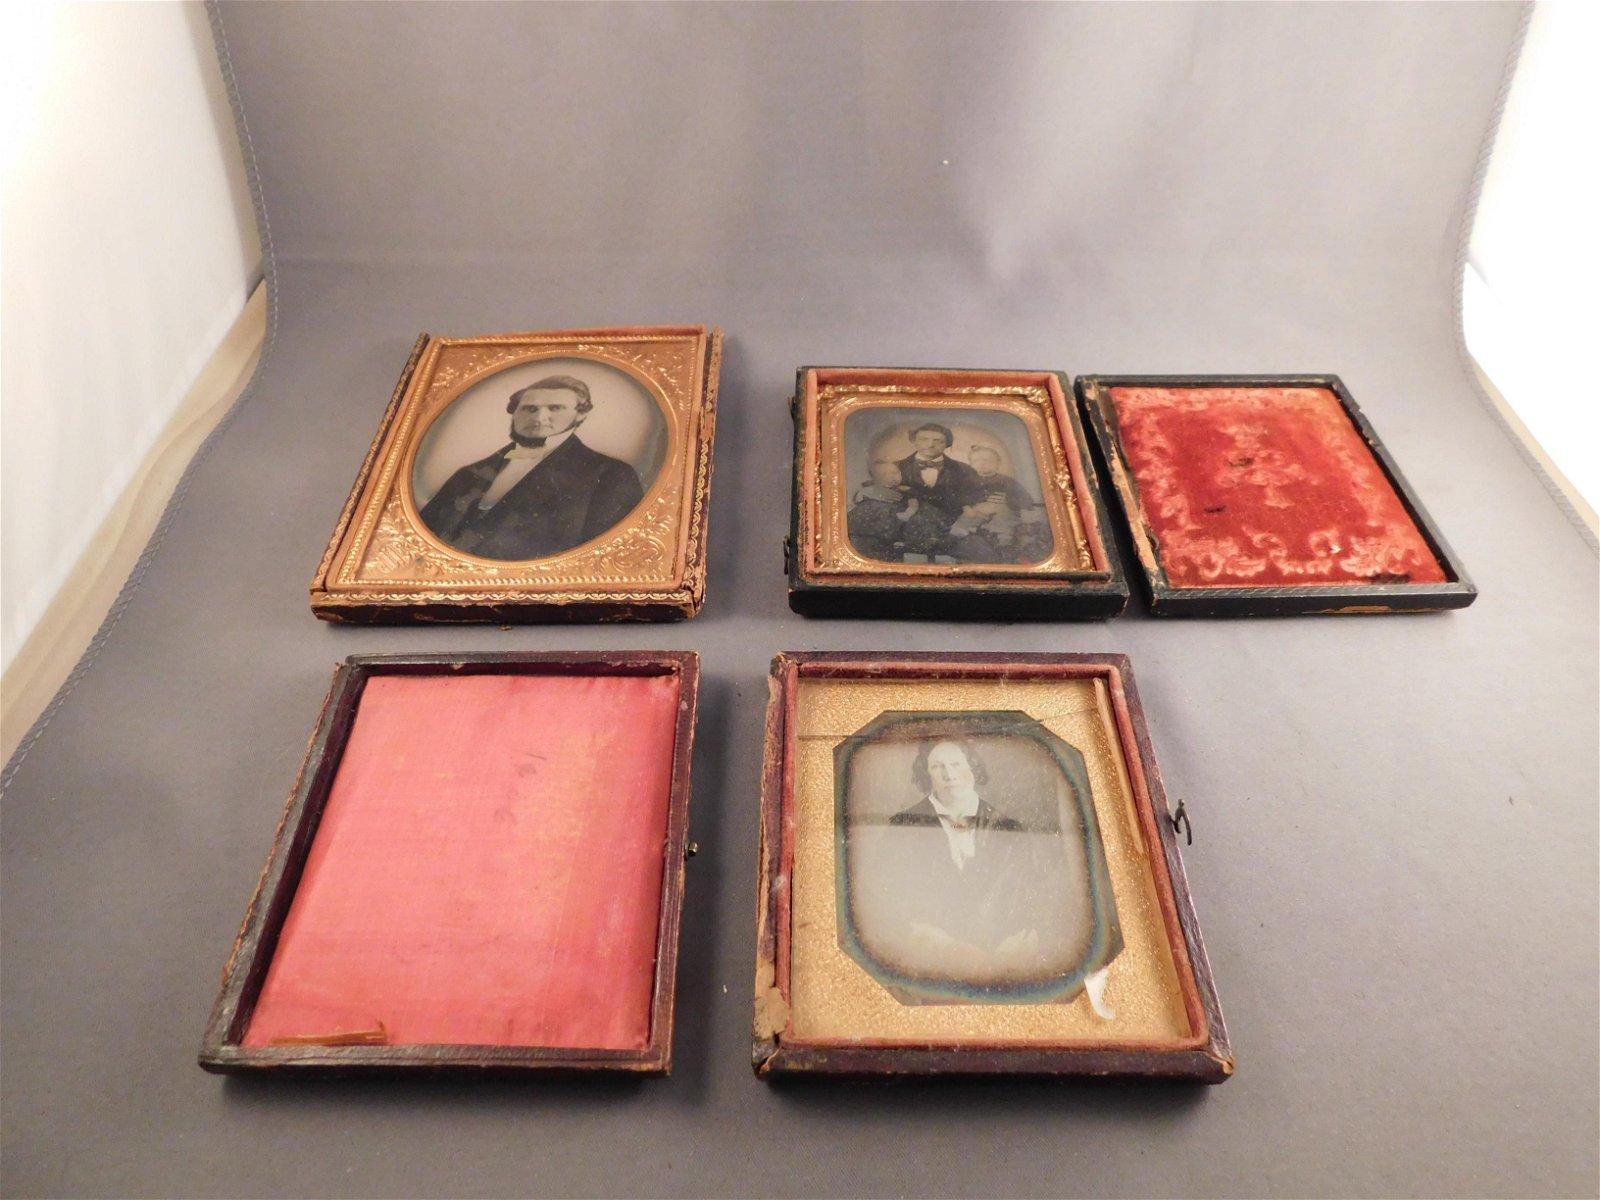 3 Ambrotypes/Daguerreotypes